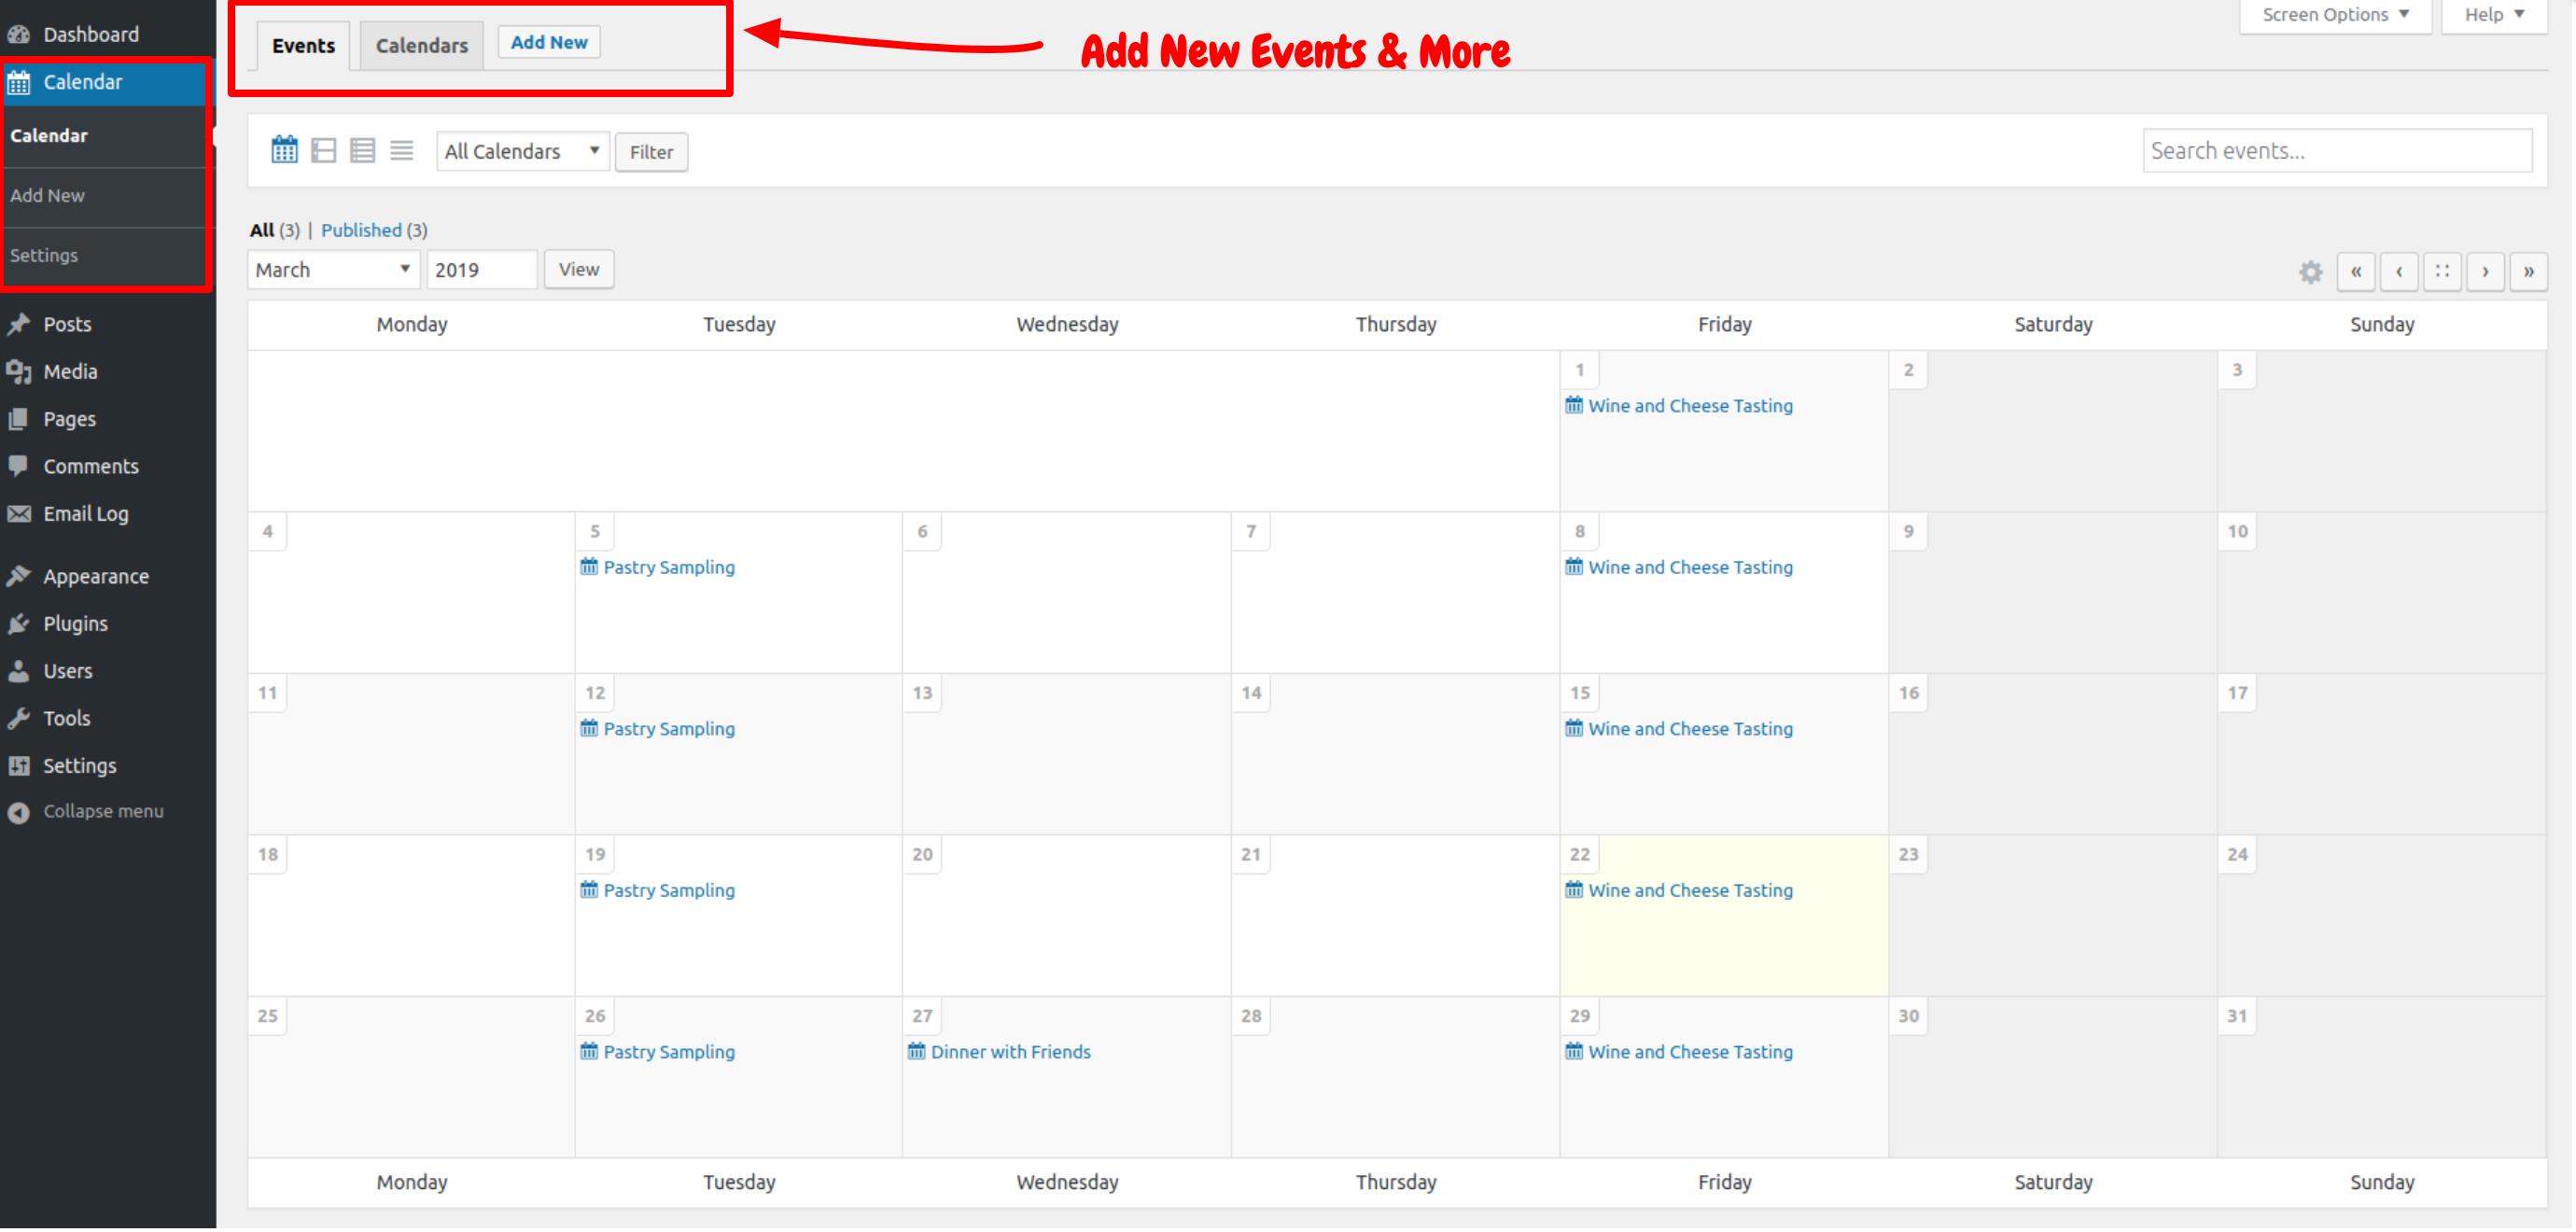 Sugar Calendar- Adding Events